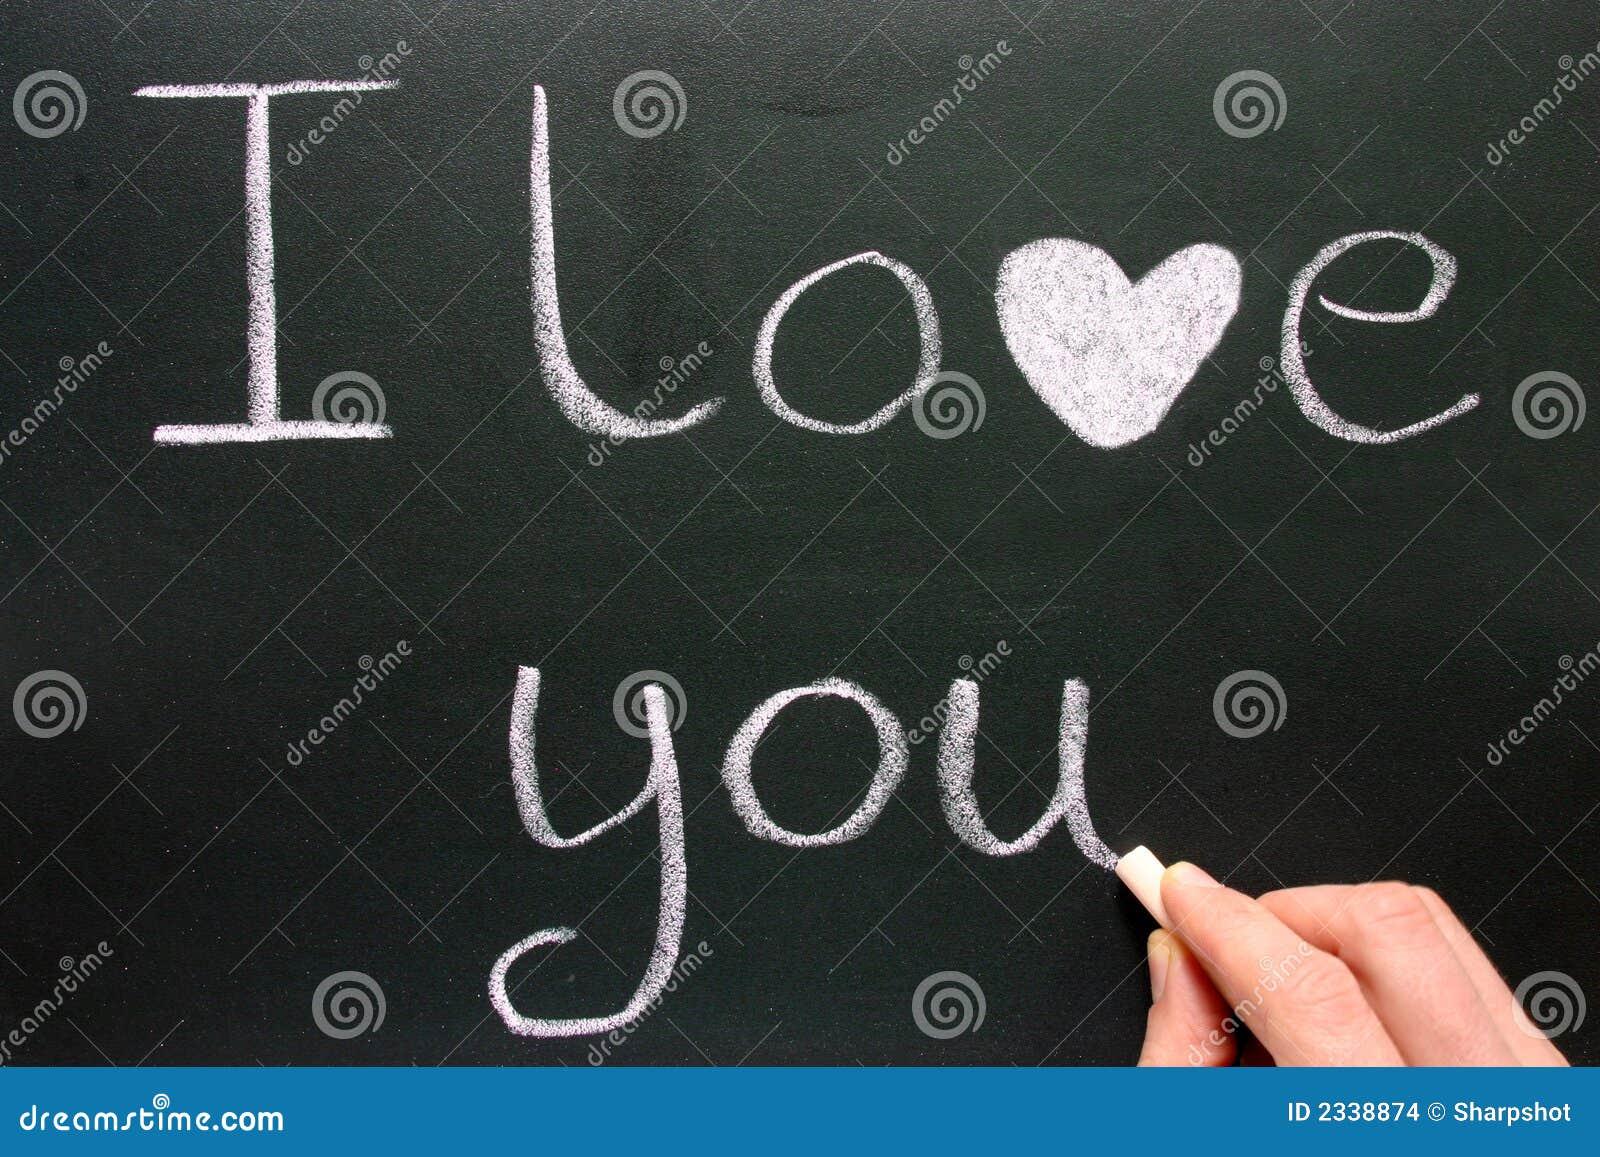 I Love You Imágenes De Stock I Love You Fotos De Stock: Writing I Love You. Stock Illustration. Image Of Chalk